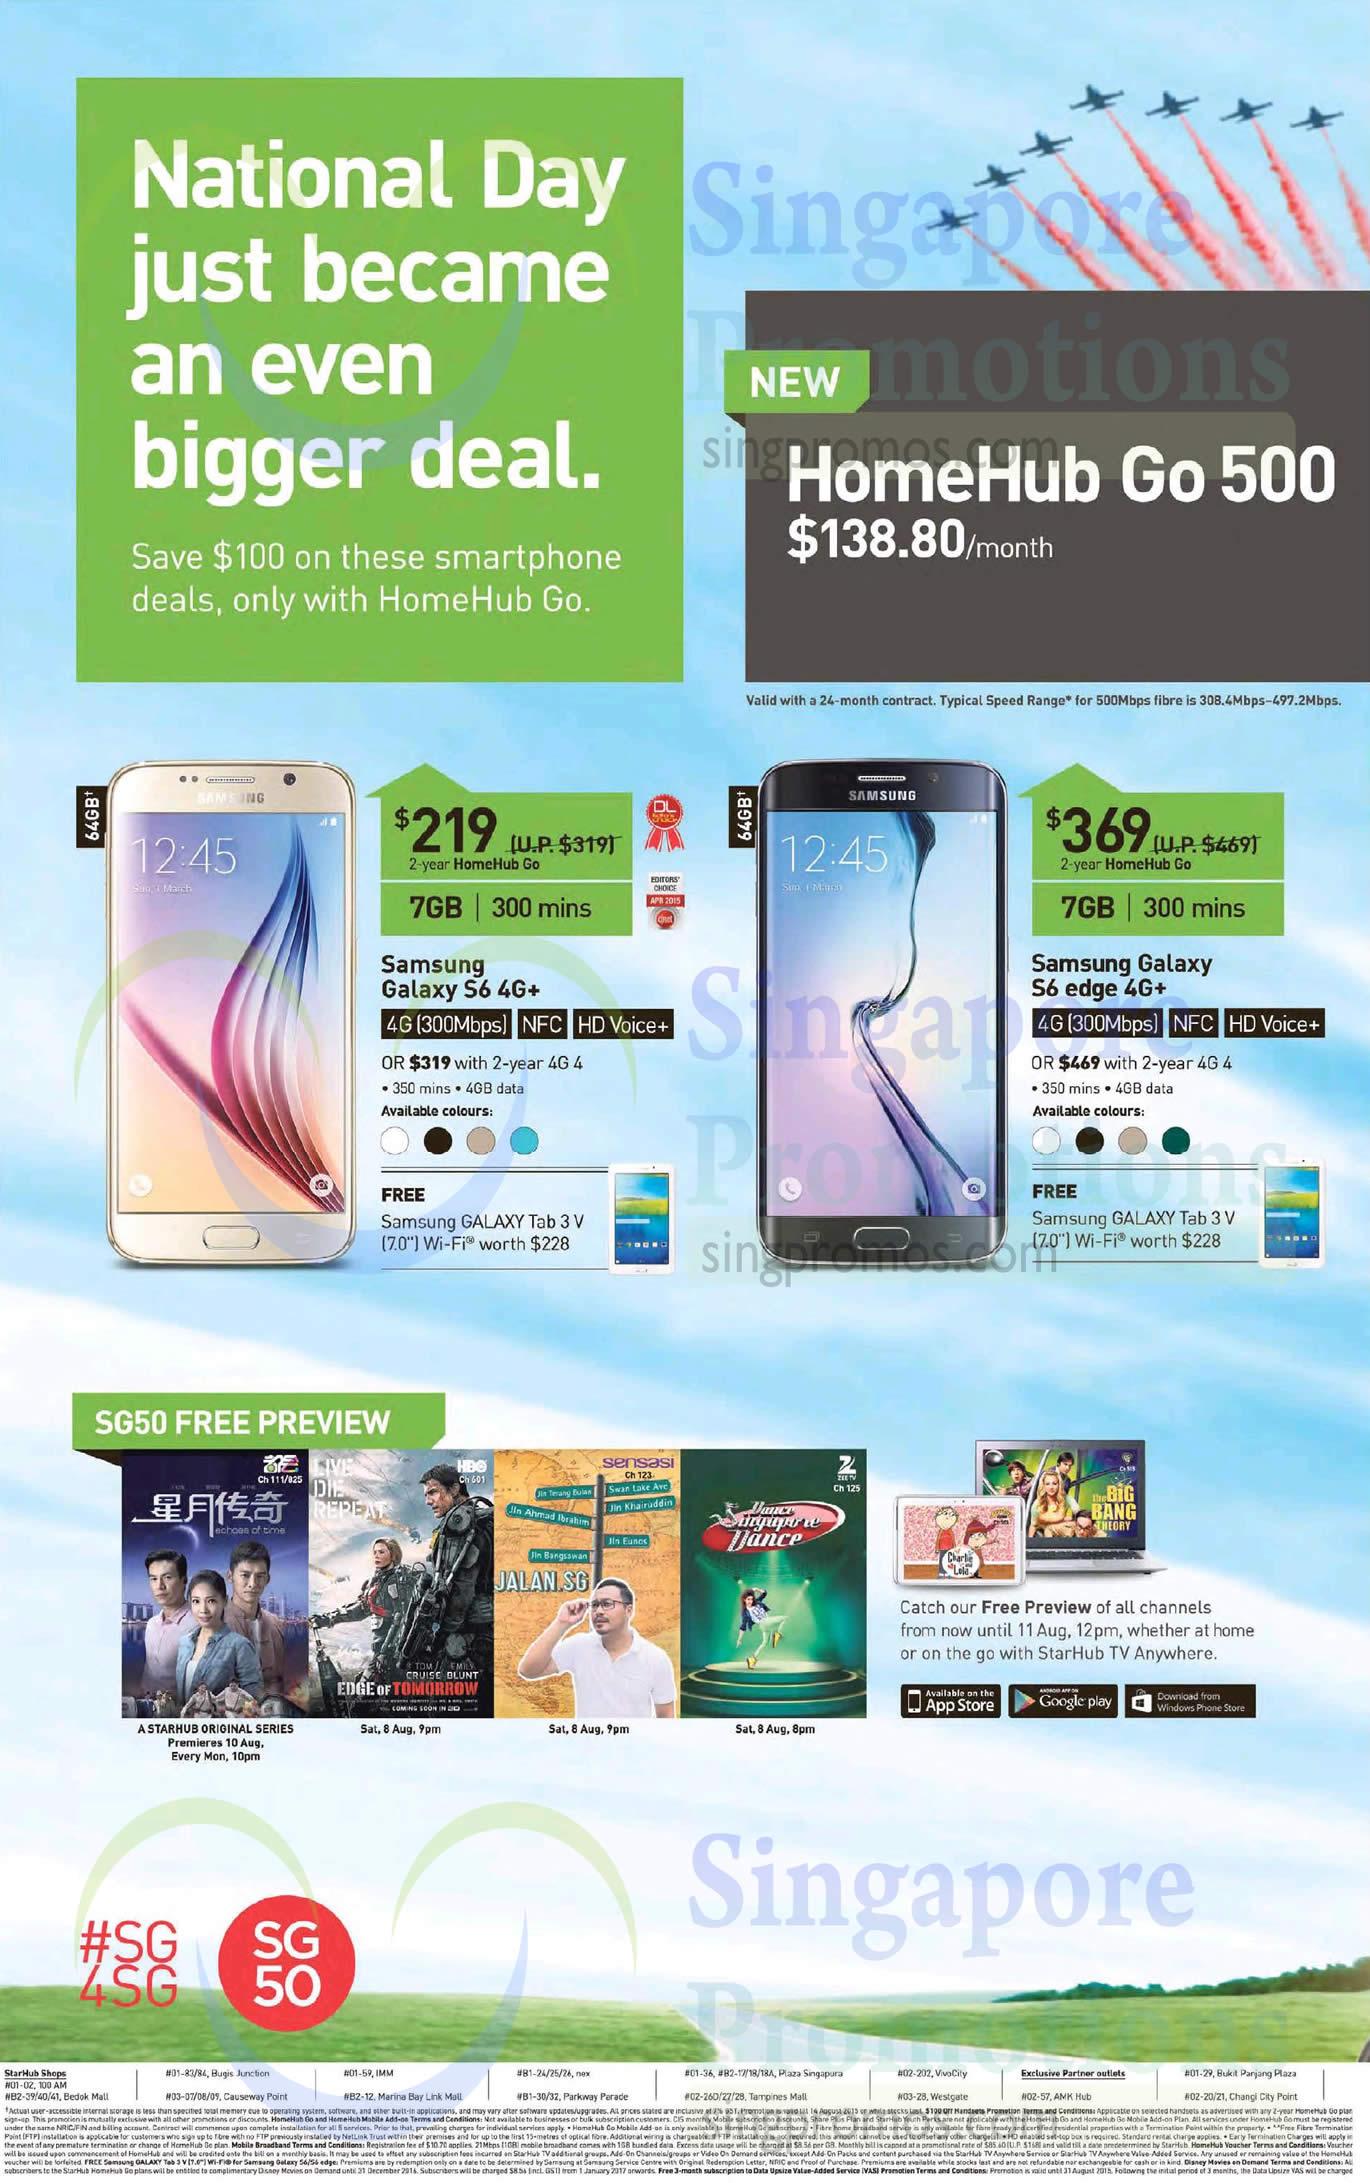 Samsung Galaxy S6, S6 Edge, SG50 Free Preview